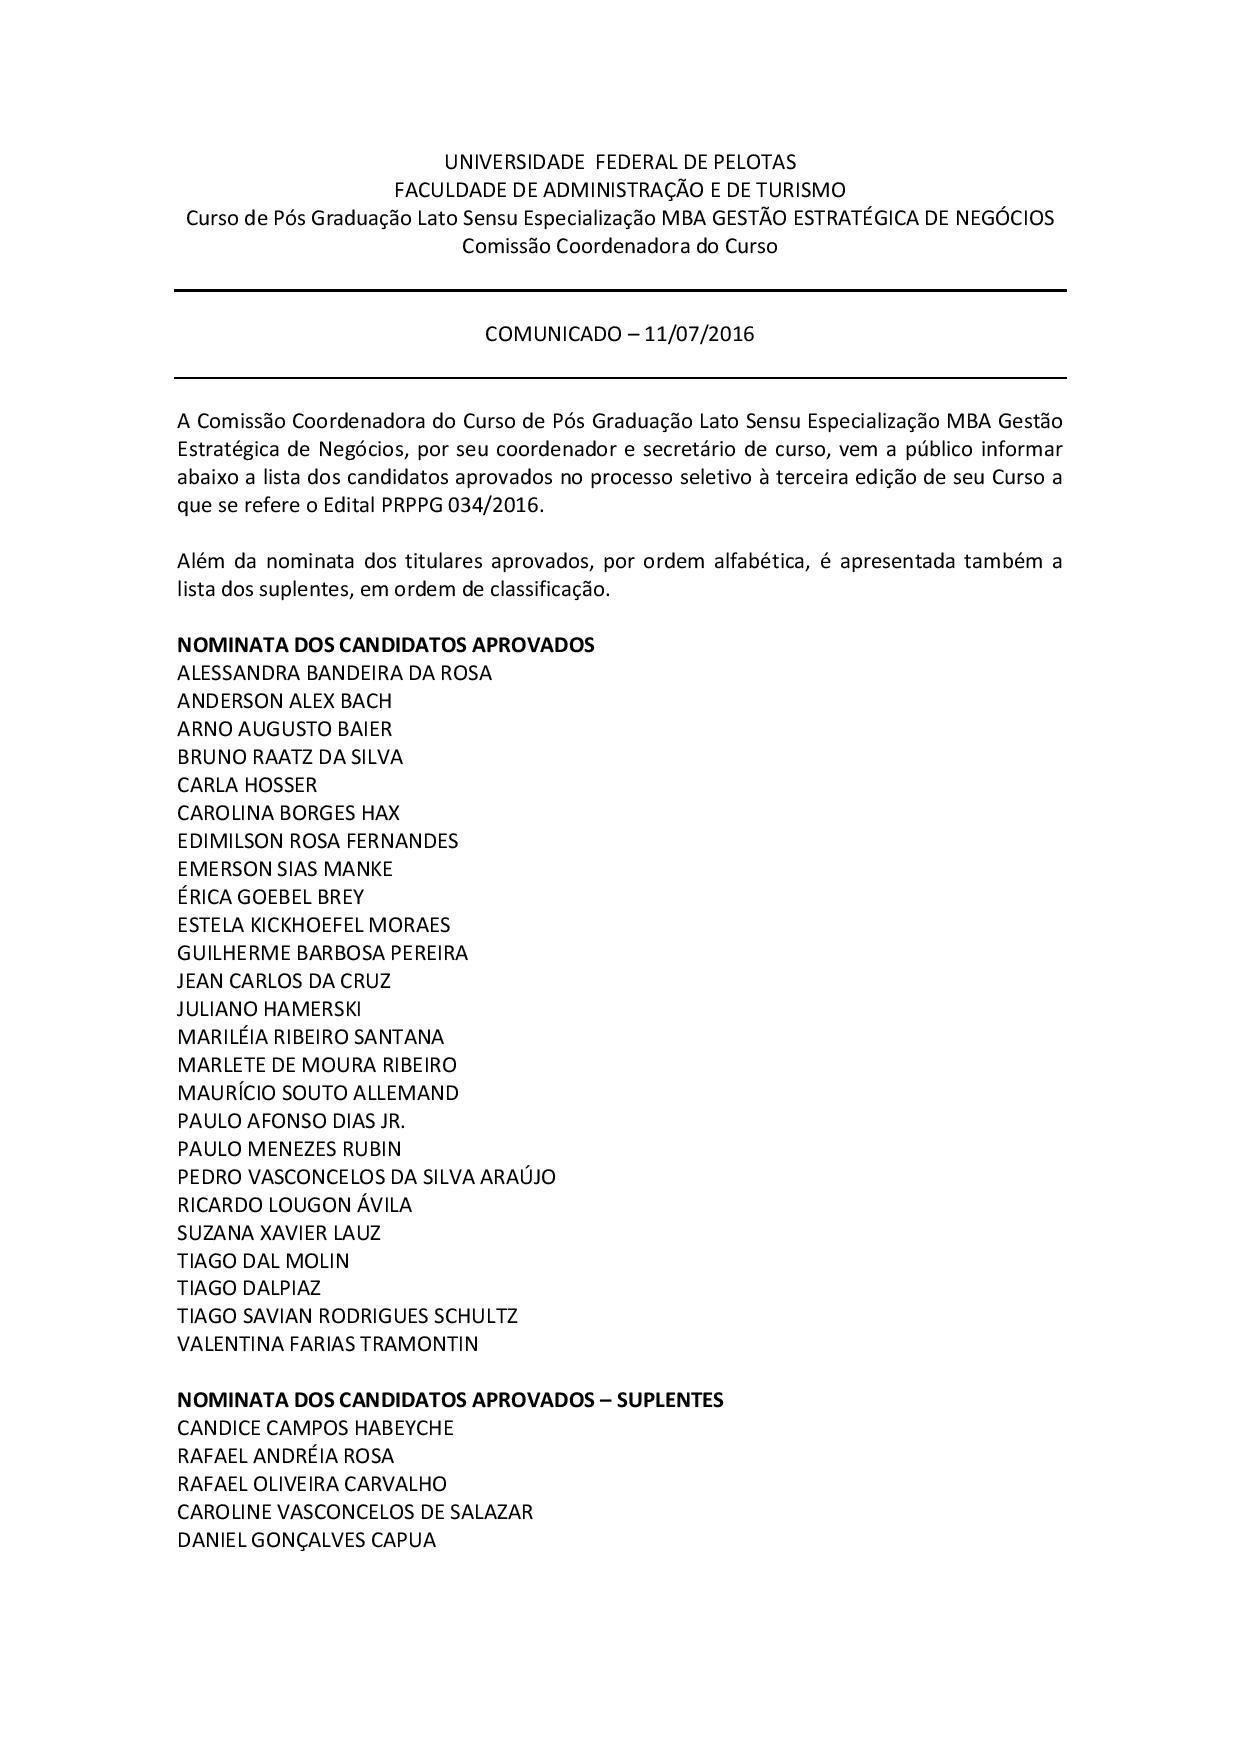 Comunicado sobre candidatos aprovados-page-001